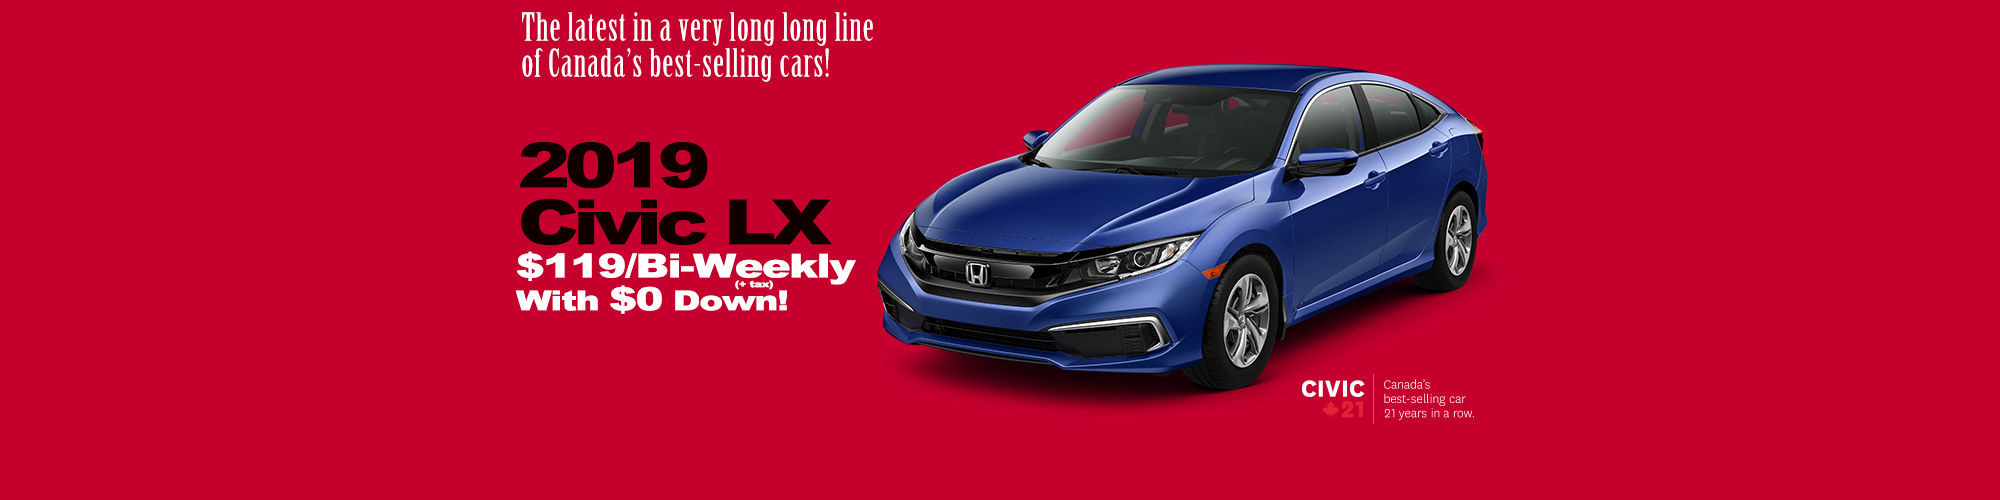 Civic LX only $119 bi-weekly (plus tax)